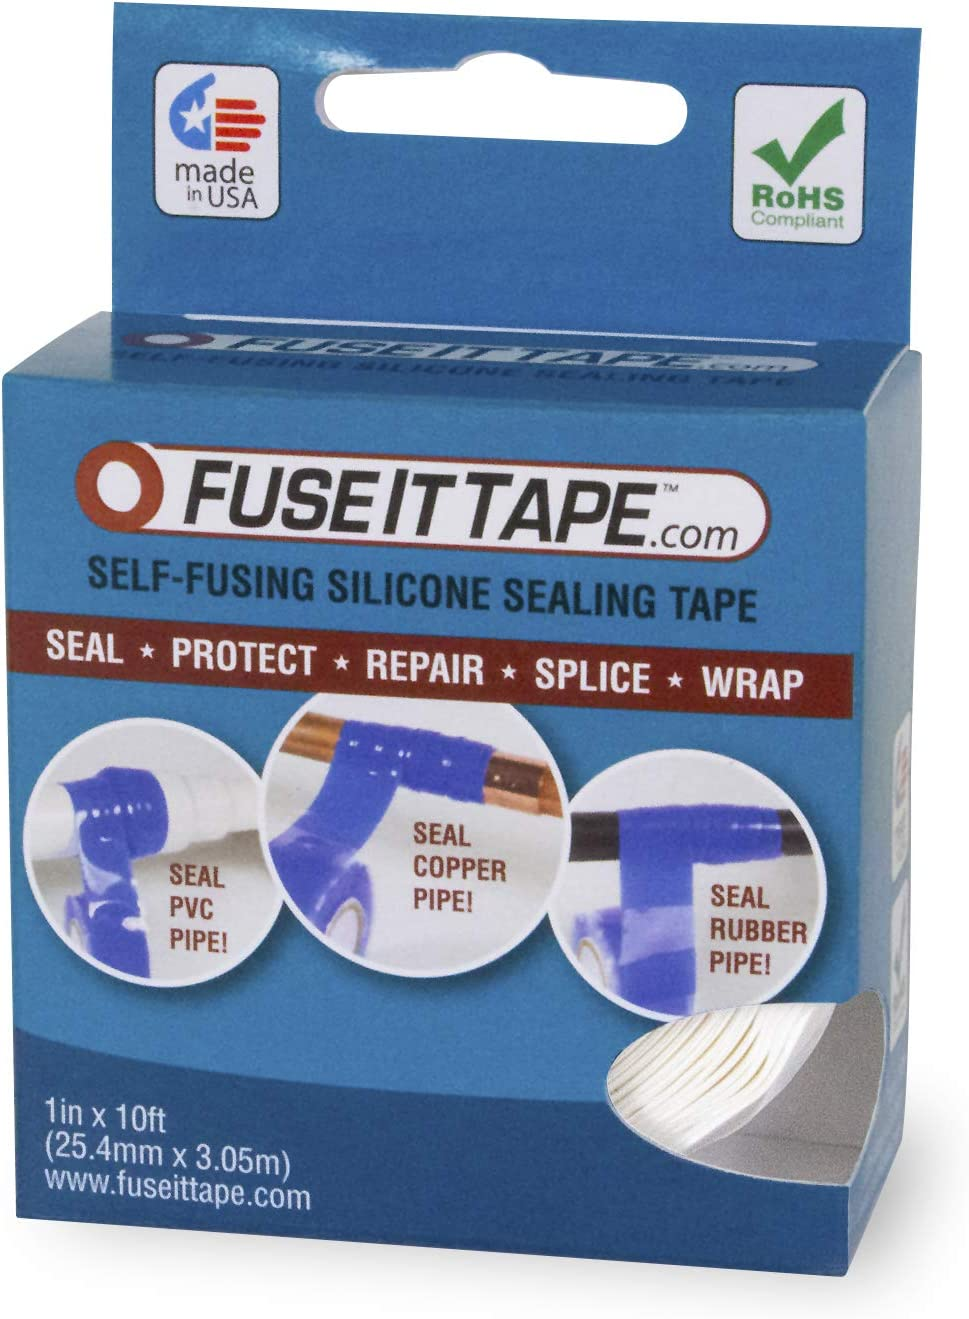 FuseIt Tape High material Self-Fusing Boston Mall Silicone 1